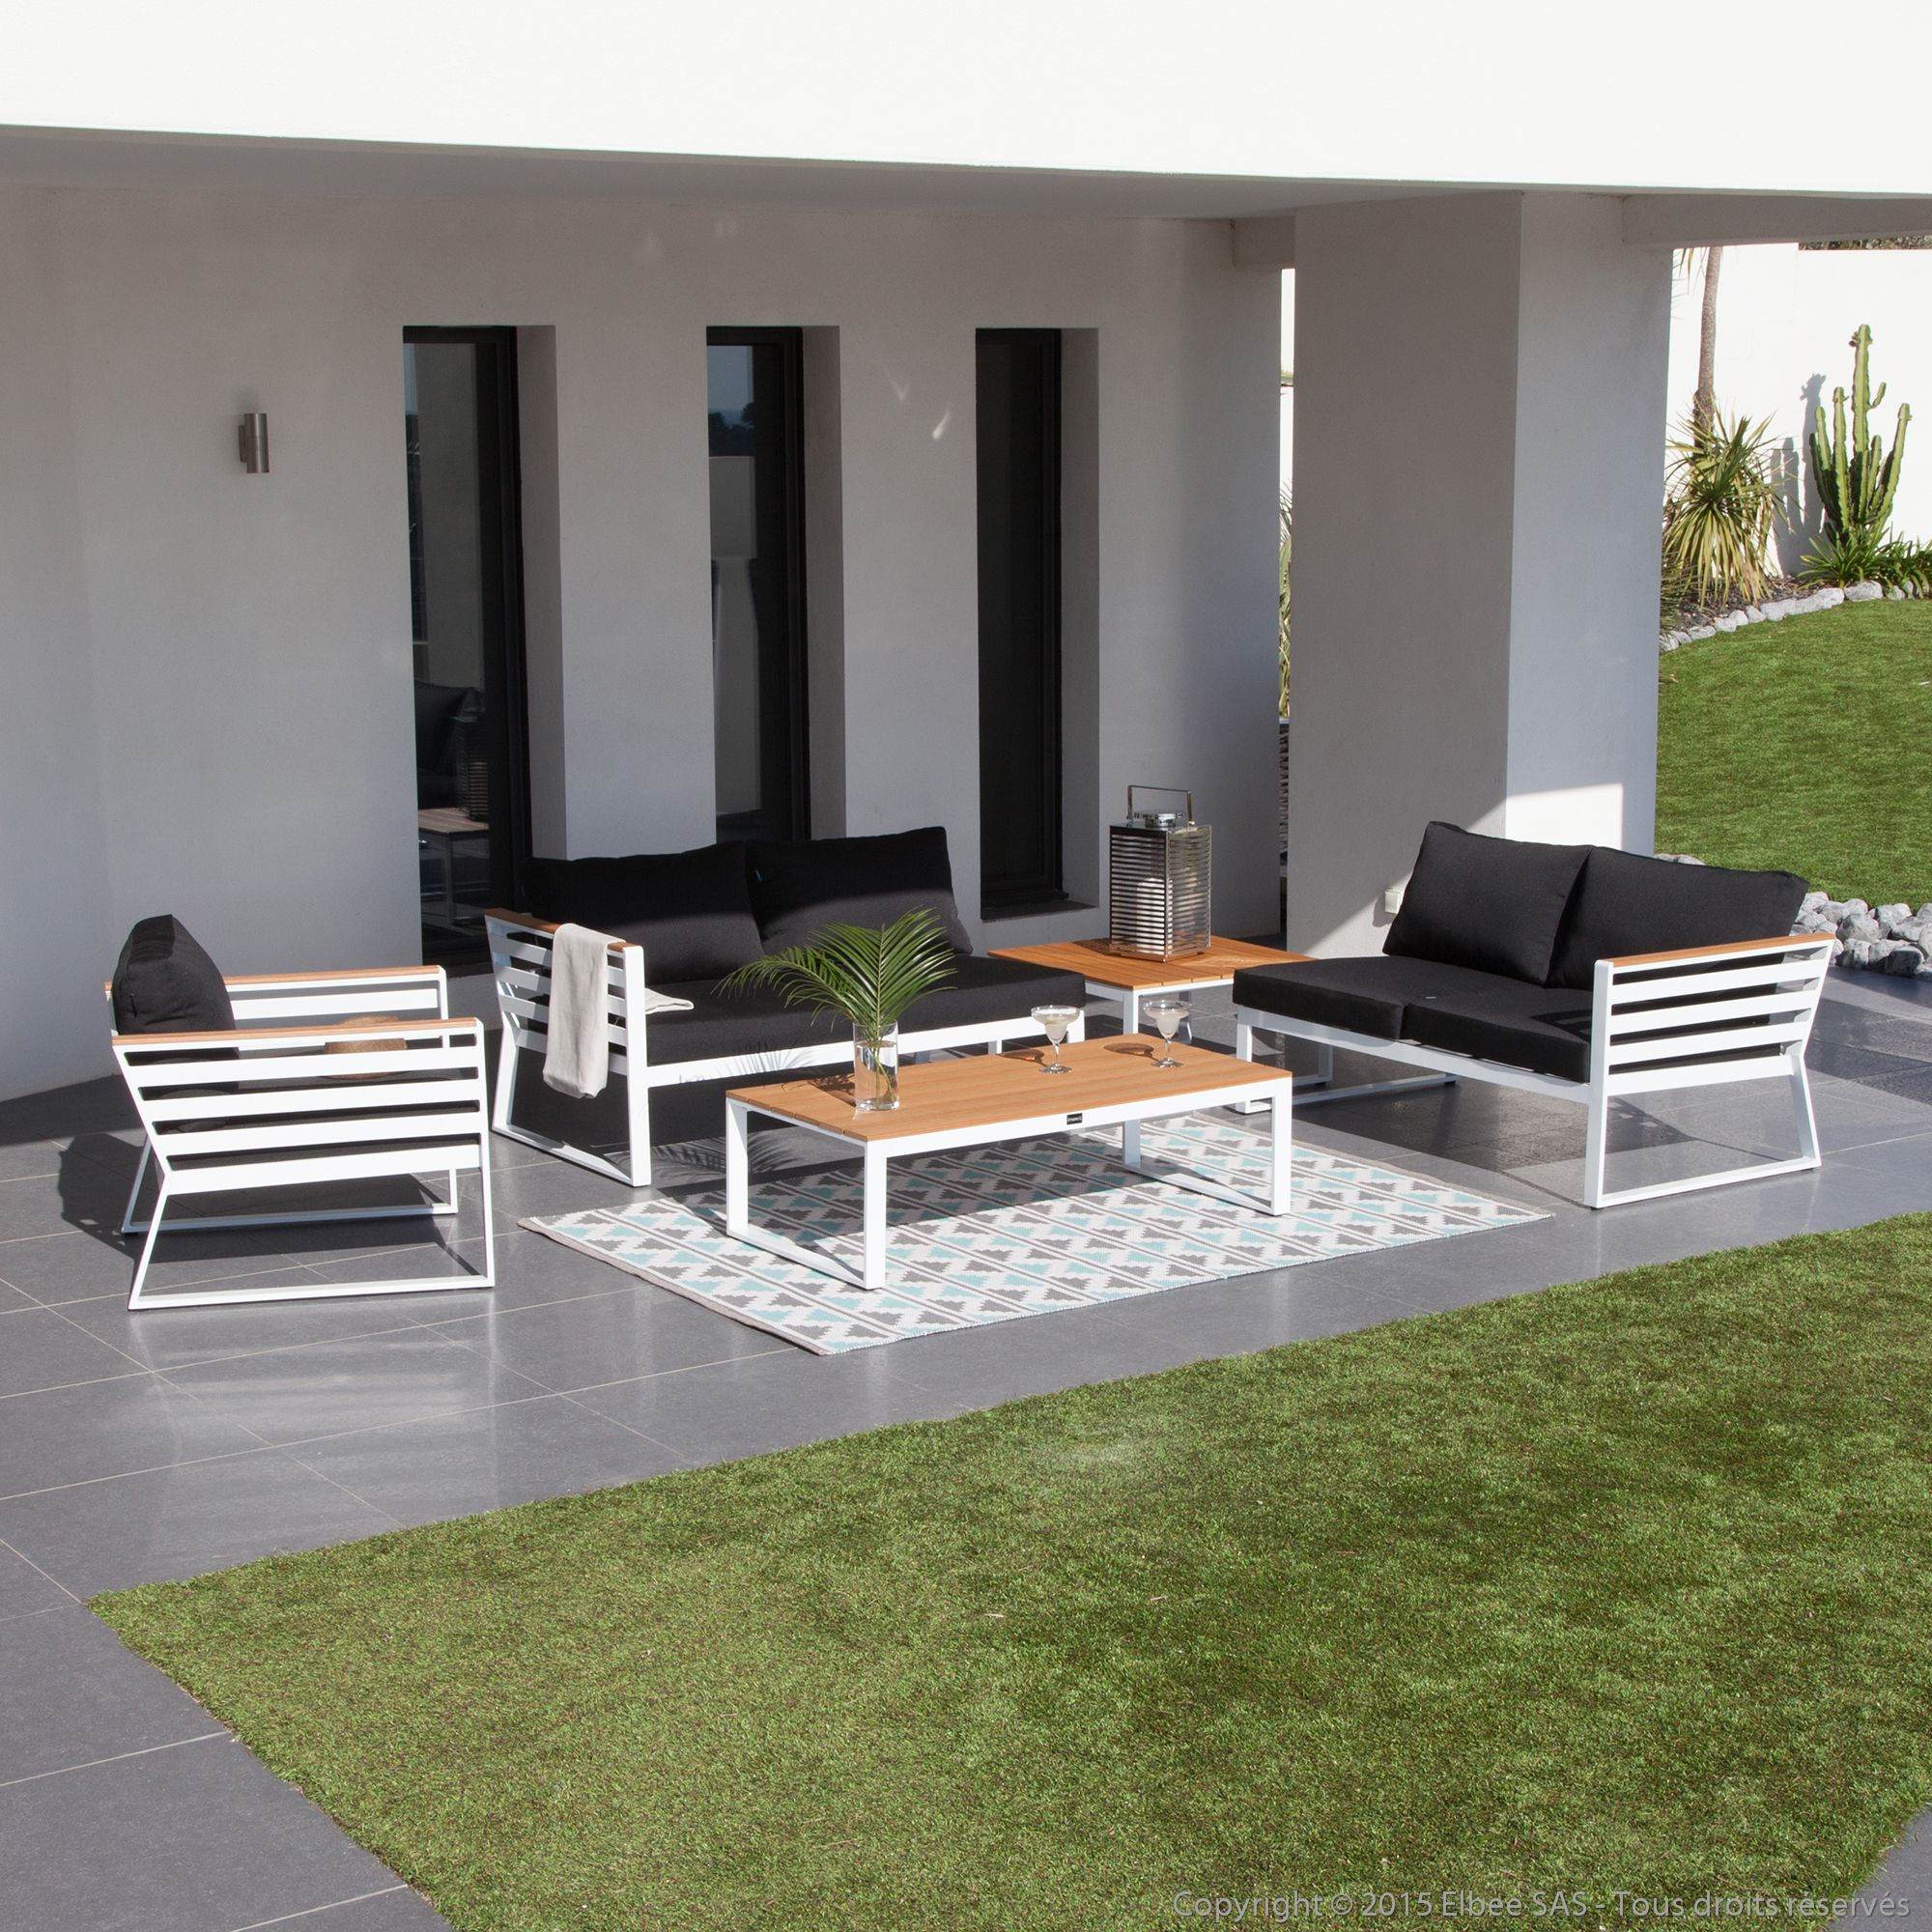 Salon de jardin 5 places : 2 canapé modulable + 1 fauteuil + 2 ...